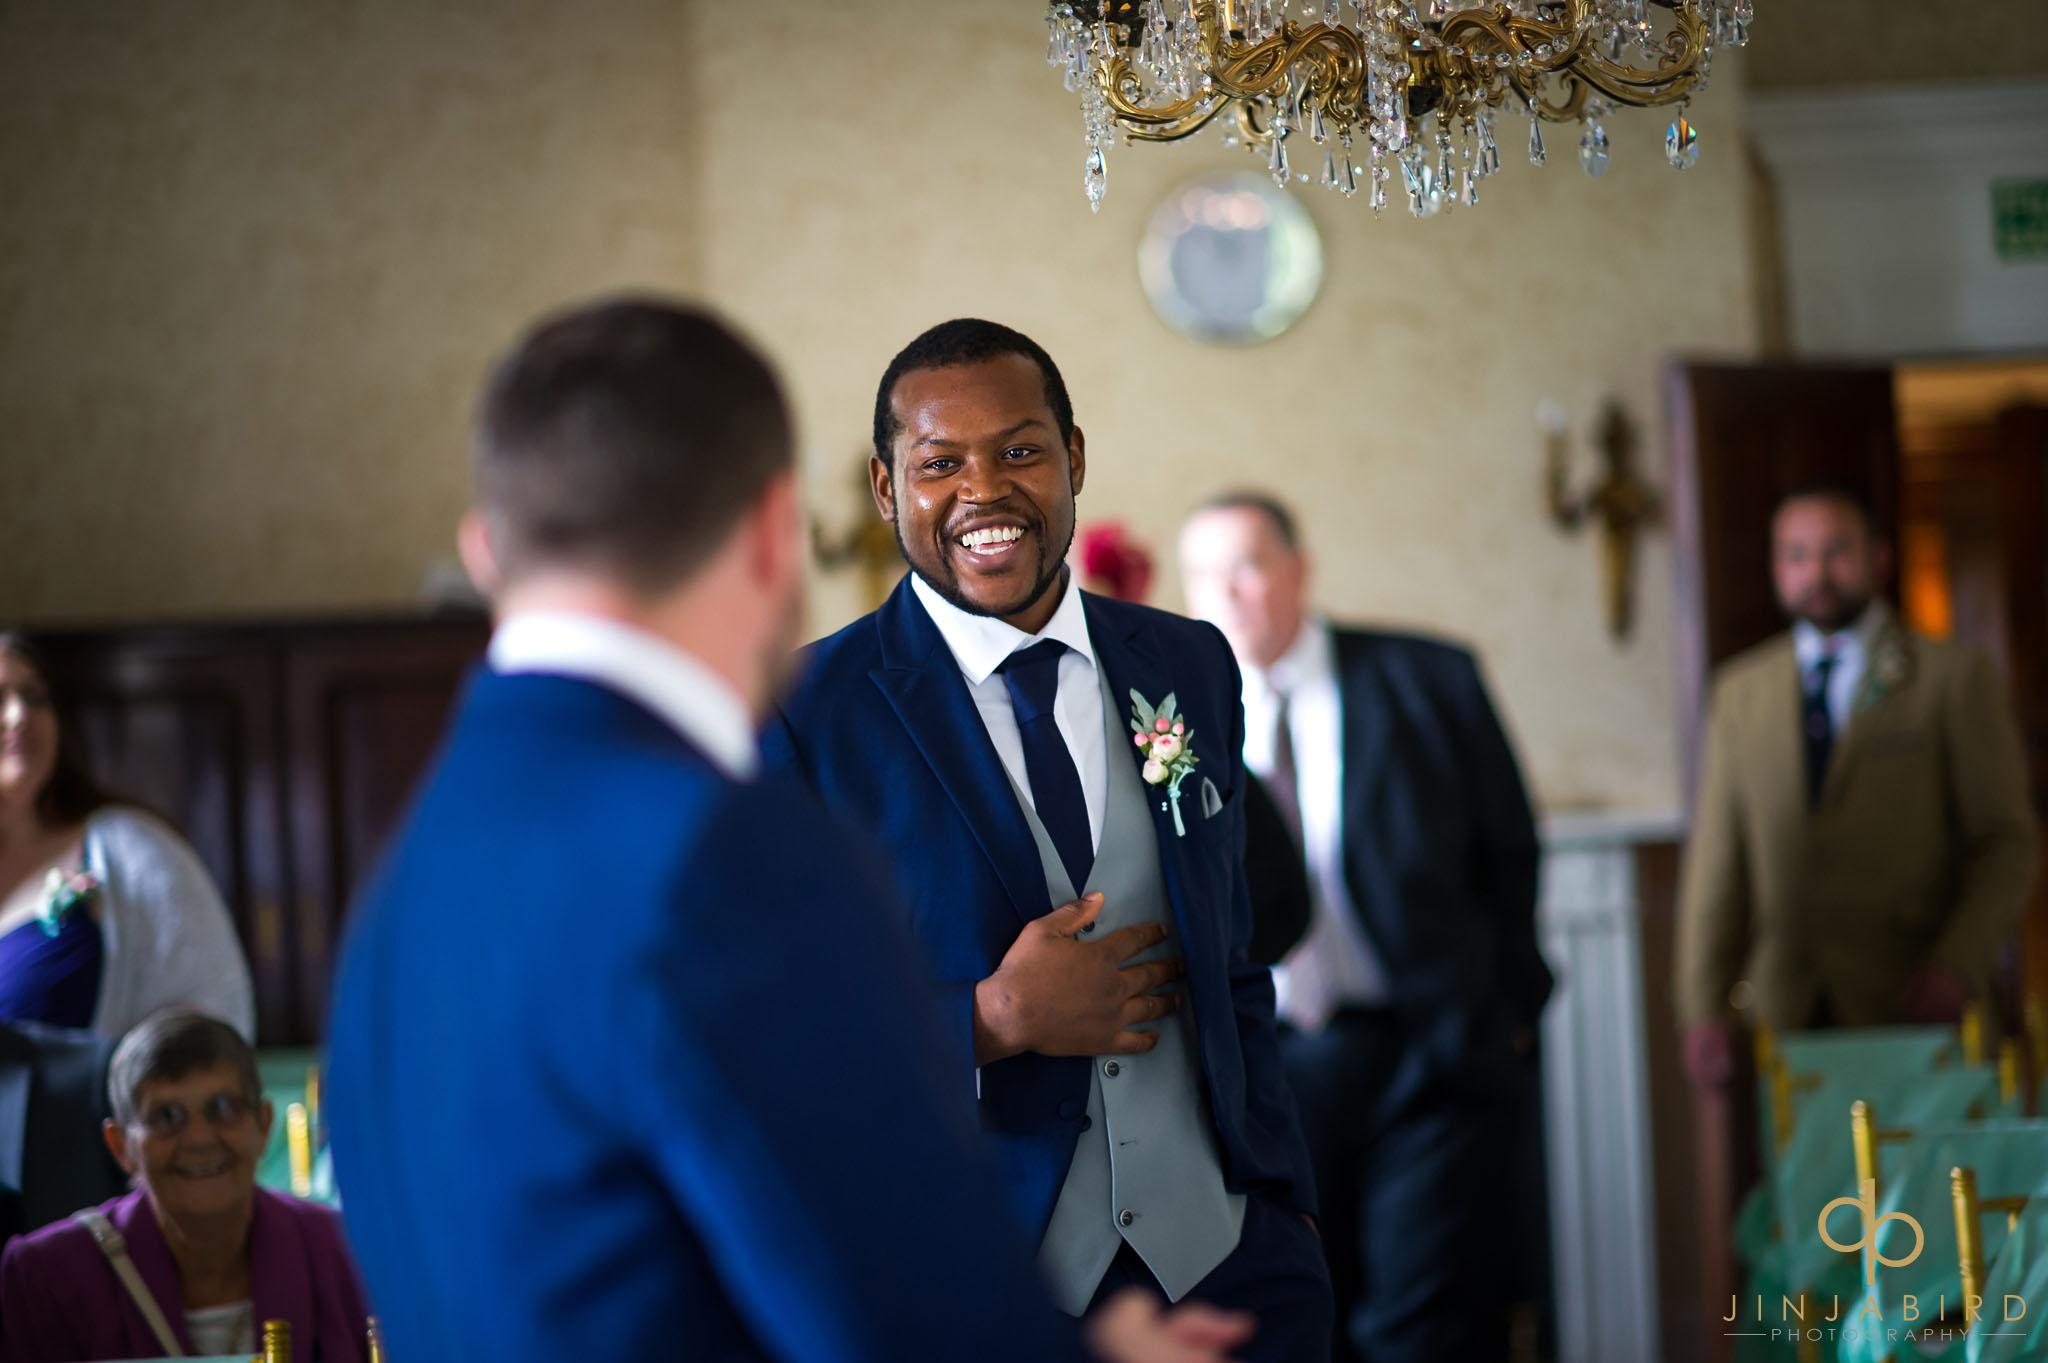 wedding-ceremony-at-highgate-house